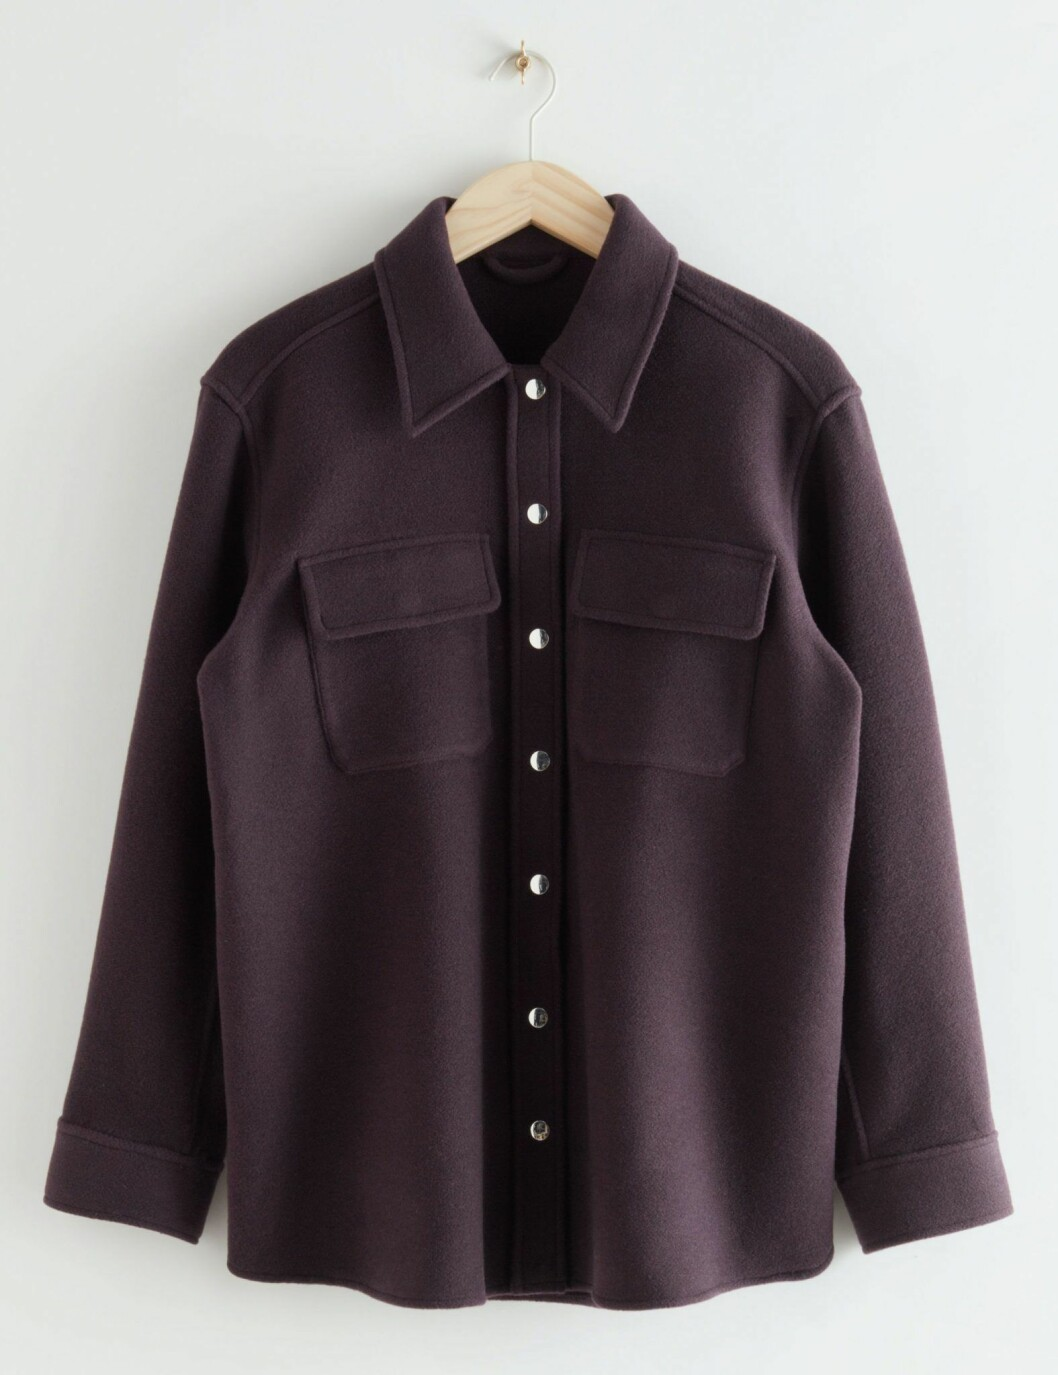 Vinröd skjortjacka från & Other stories.